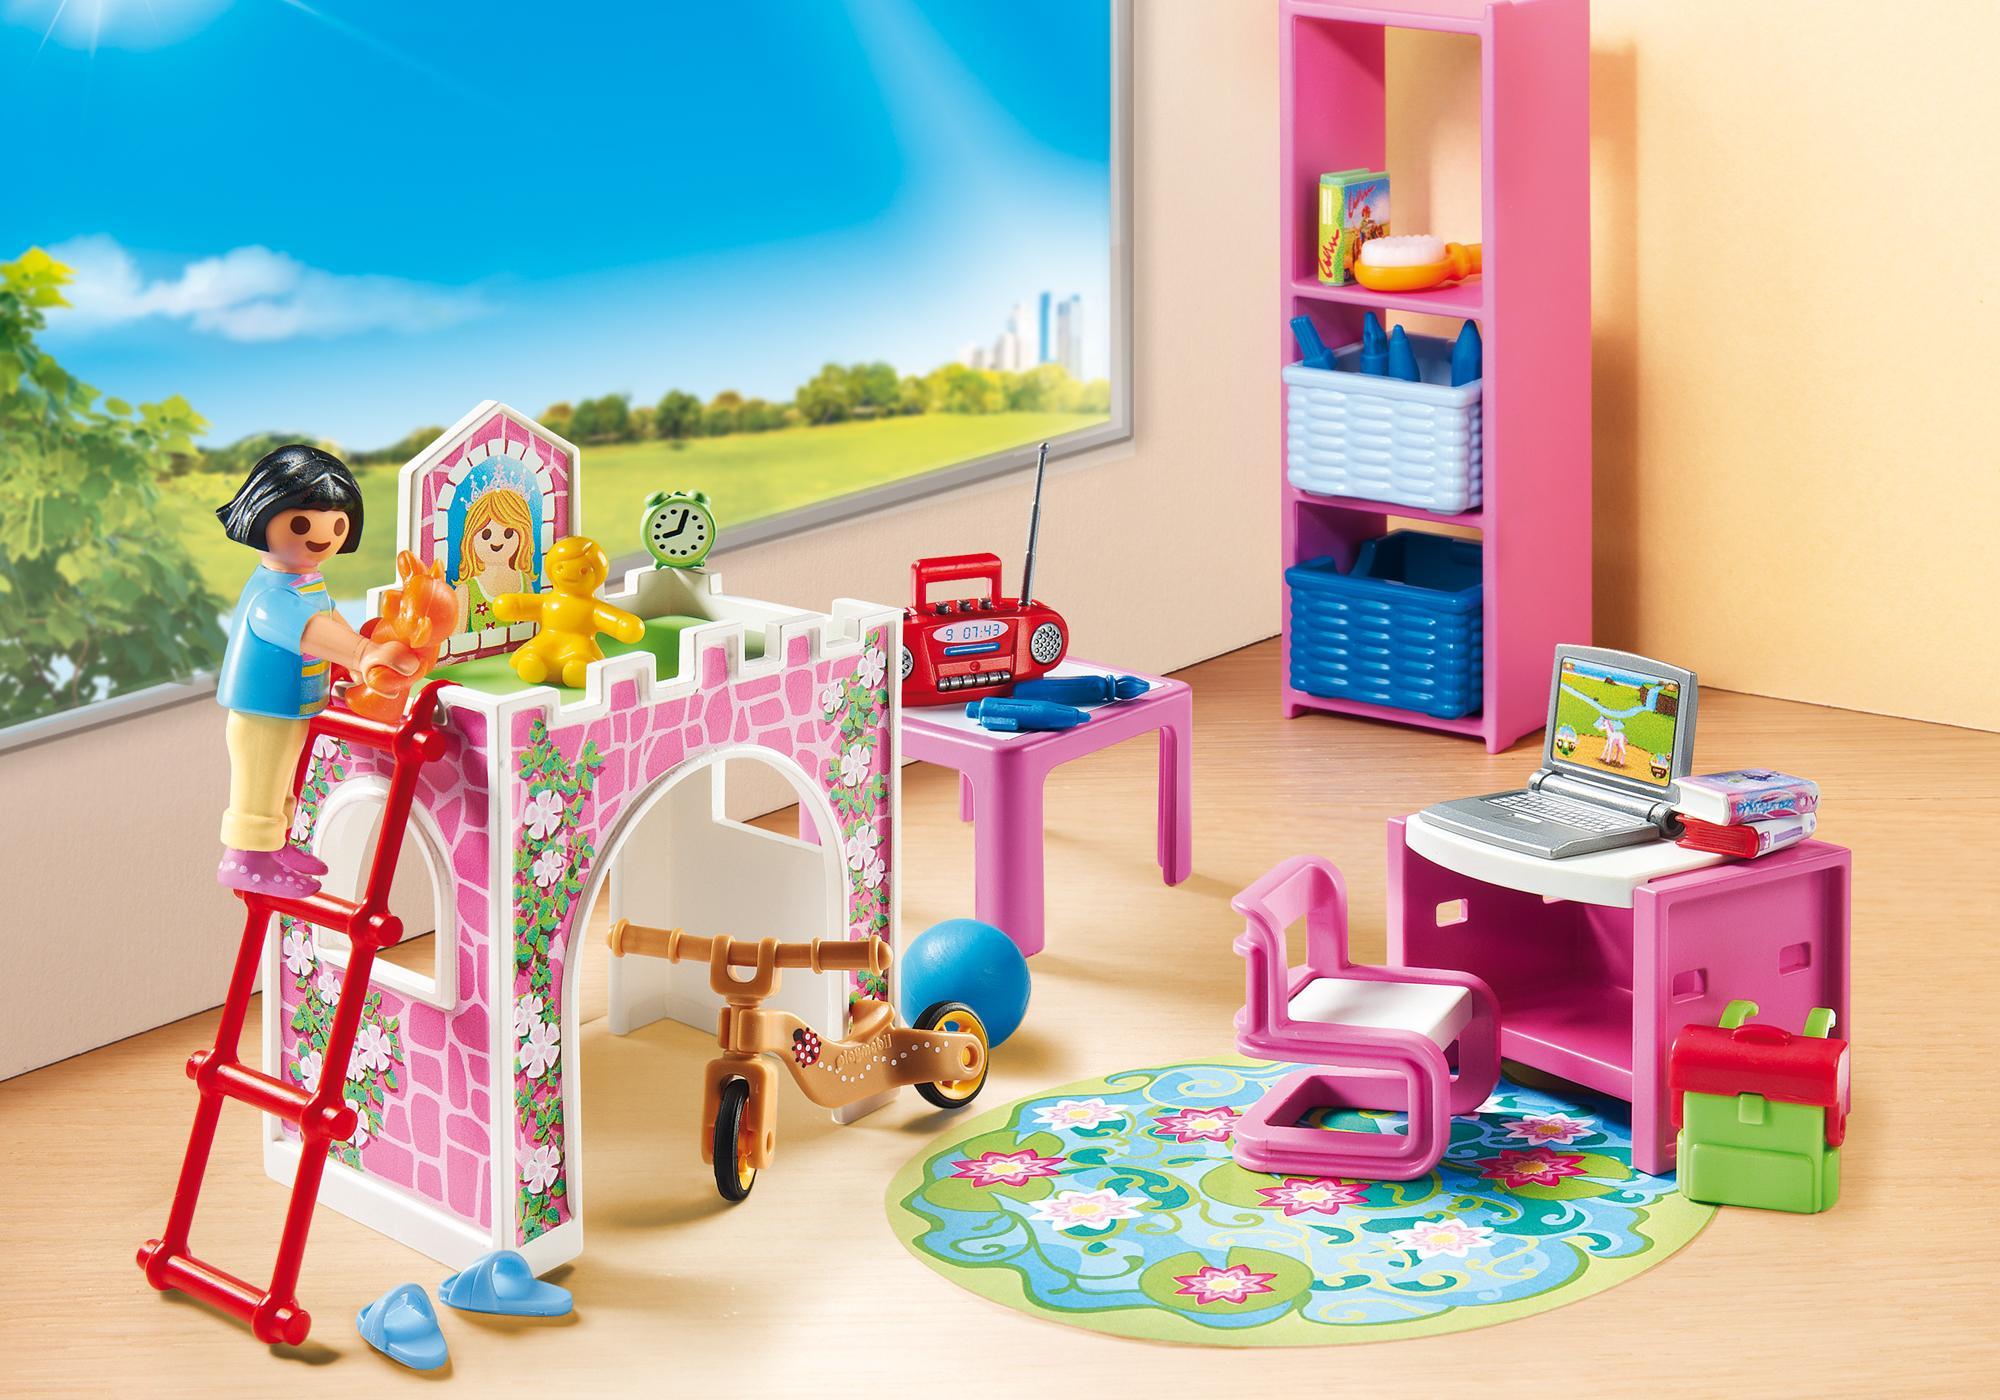 9270_product_detail/Children's Room